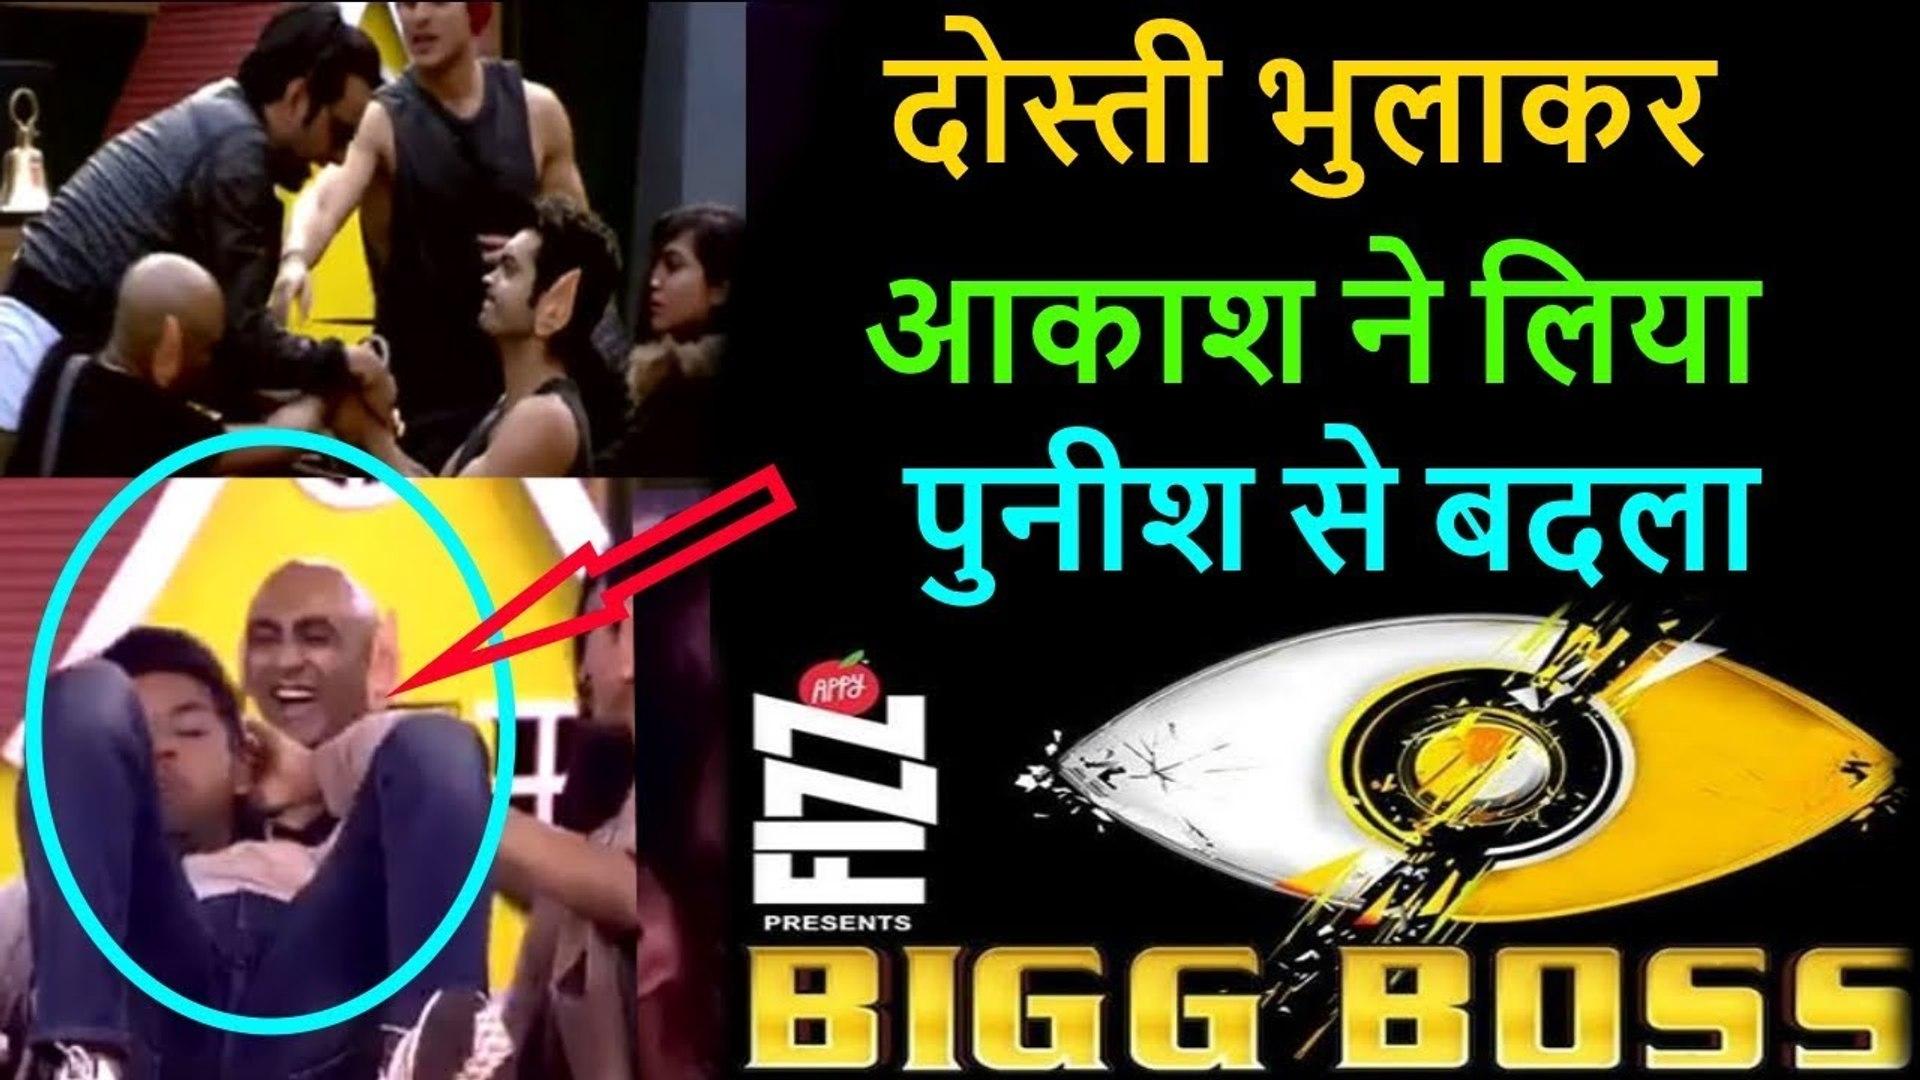 Bigg boss 11_ AKASH DADLANI revenge from Puneesh and Bandagi in Bigg boss task